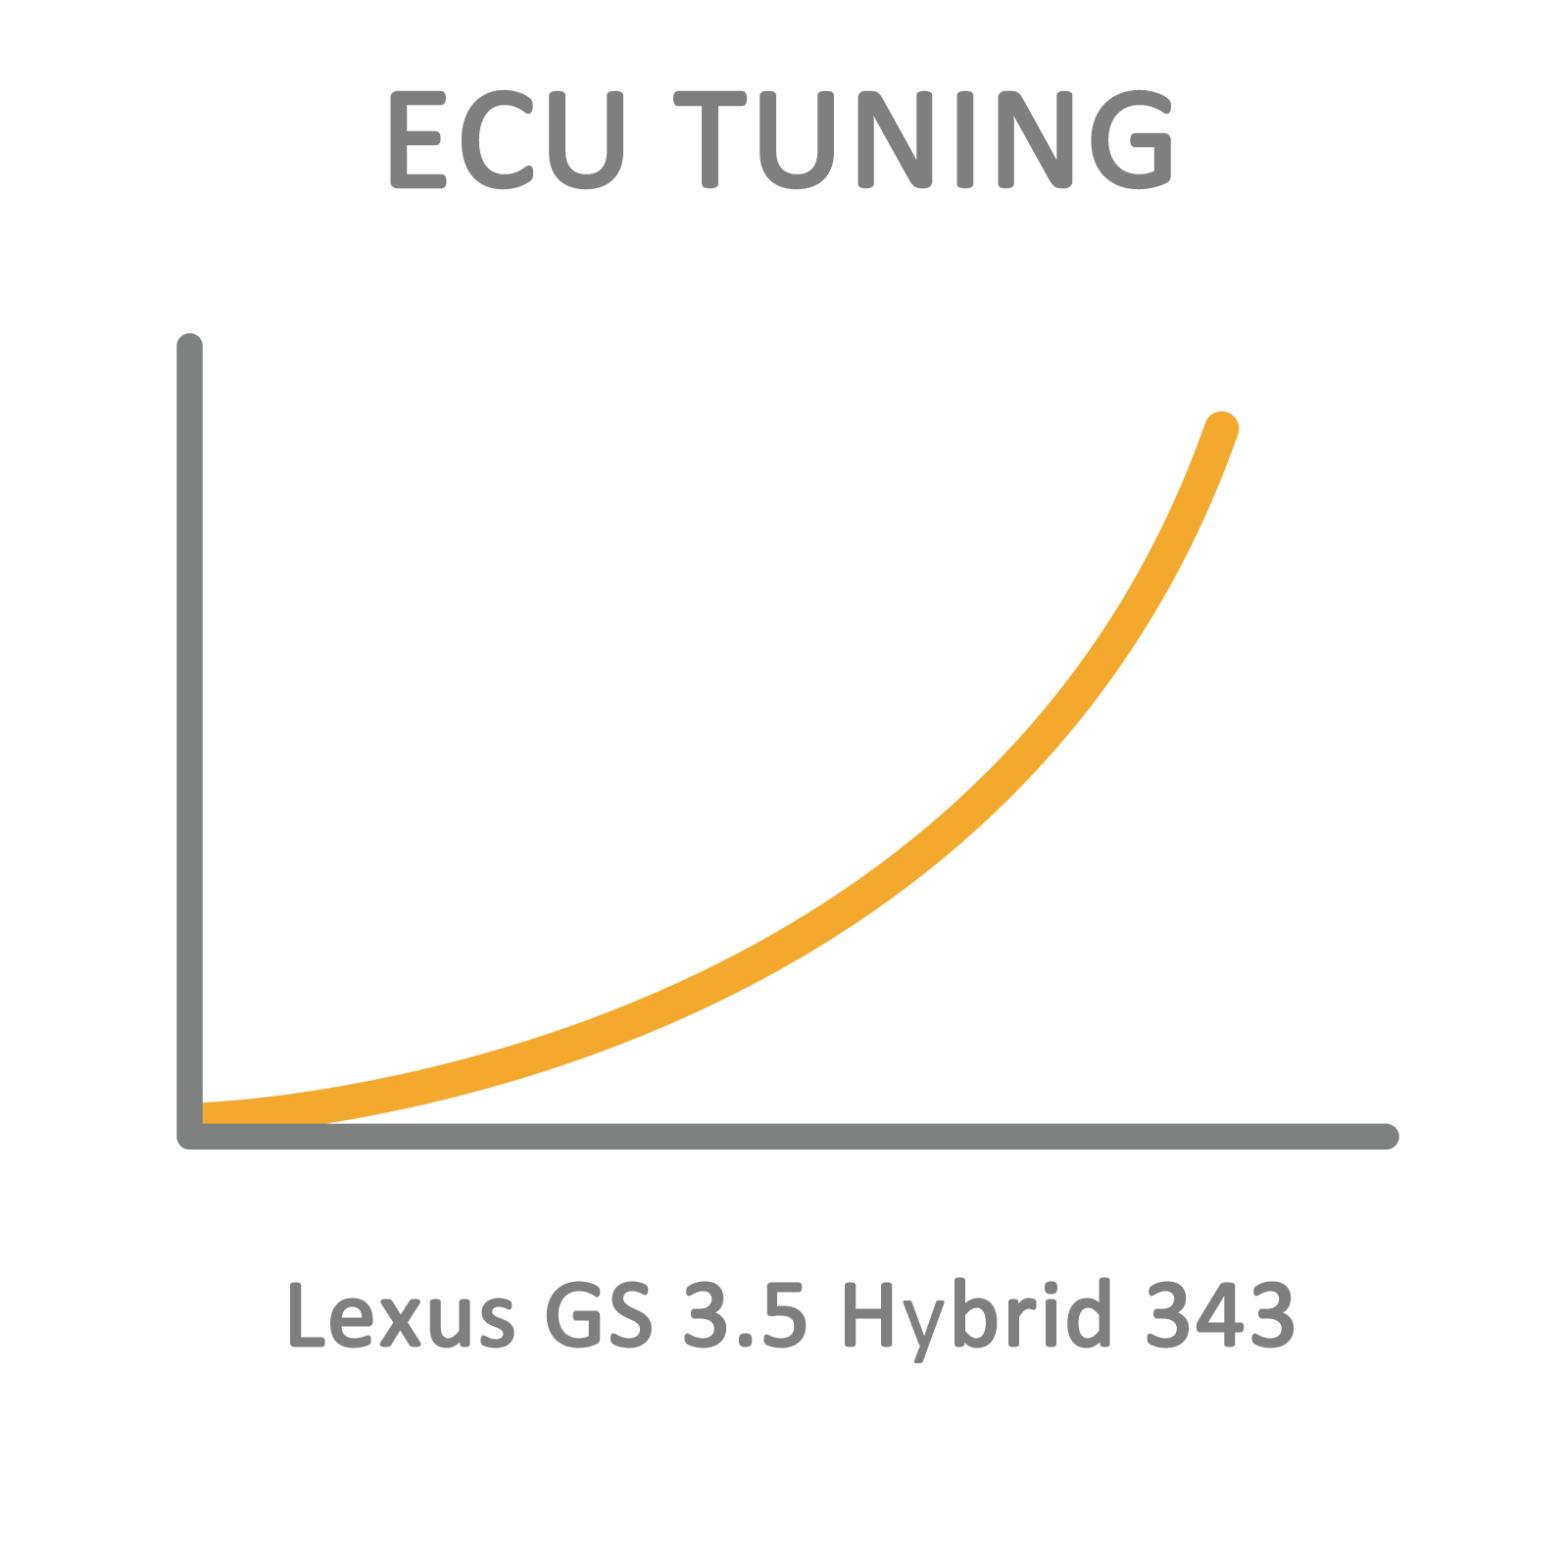 Lexus GS 3.5 Hybrid 343 ECU Tuning Remapping Programming